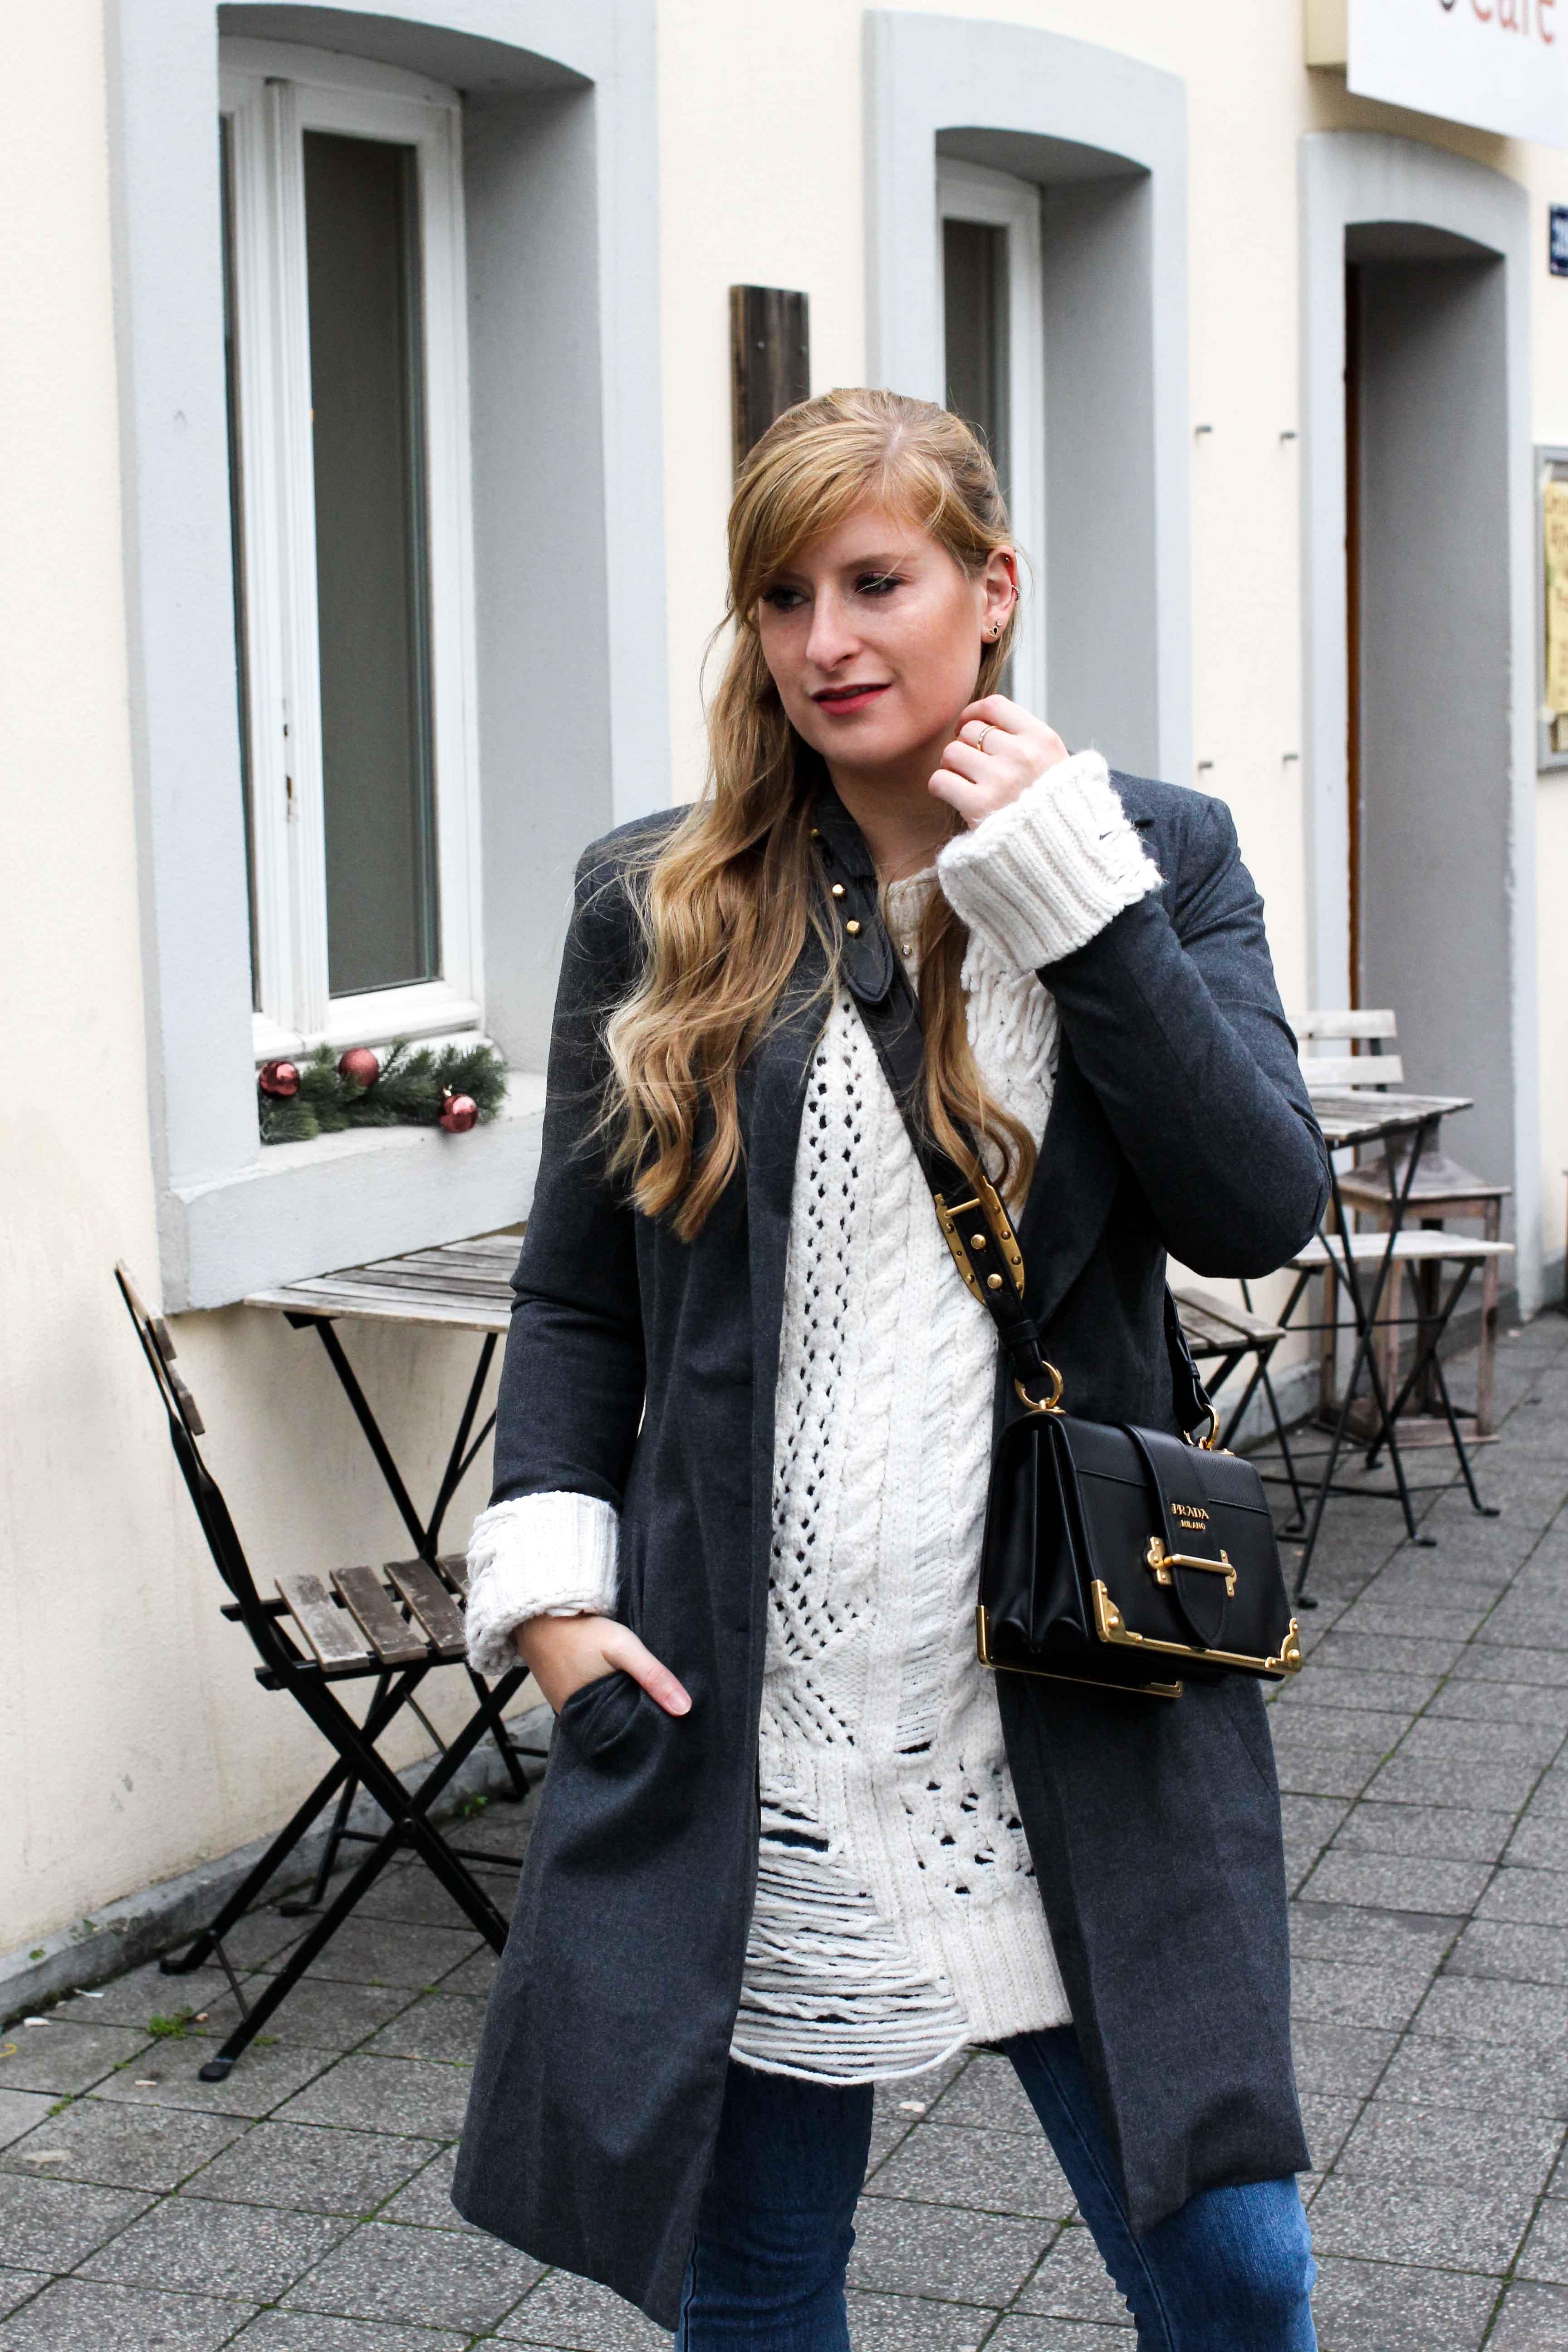 Outfit Zara Wollpullover kombinieren Blue Jeans NAKD Winterlook Prada Cahier Tasche Classy Cozy Modeblog Bonn 2